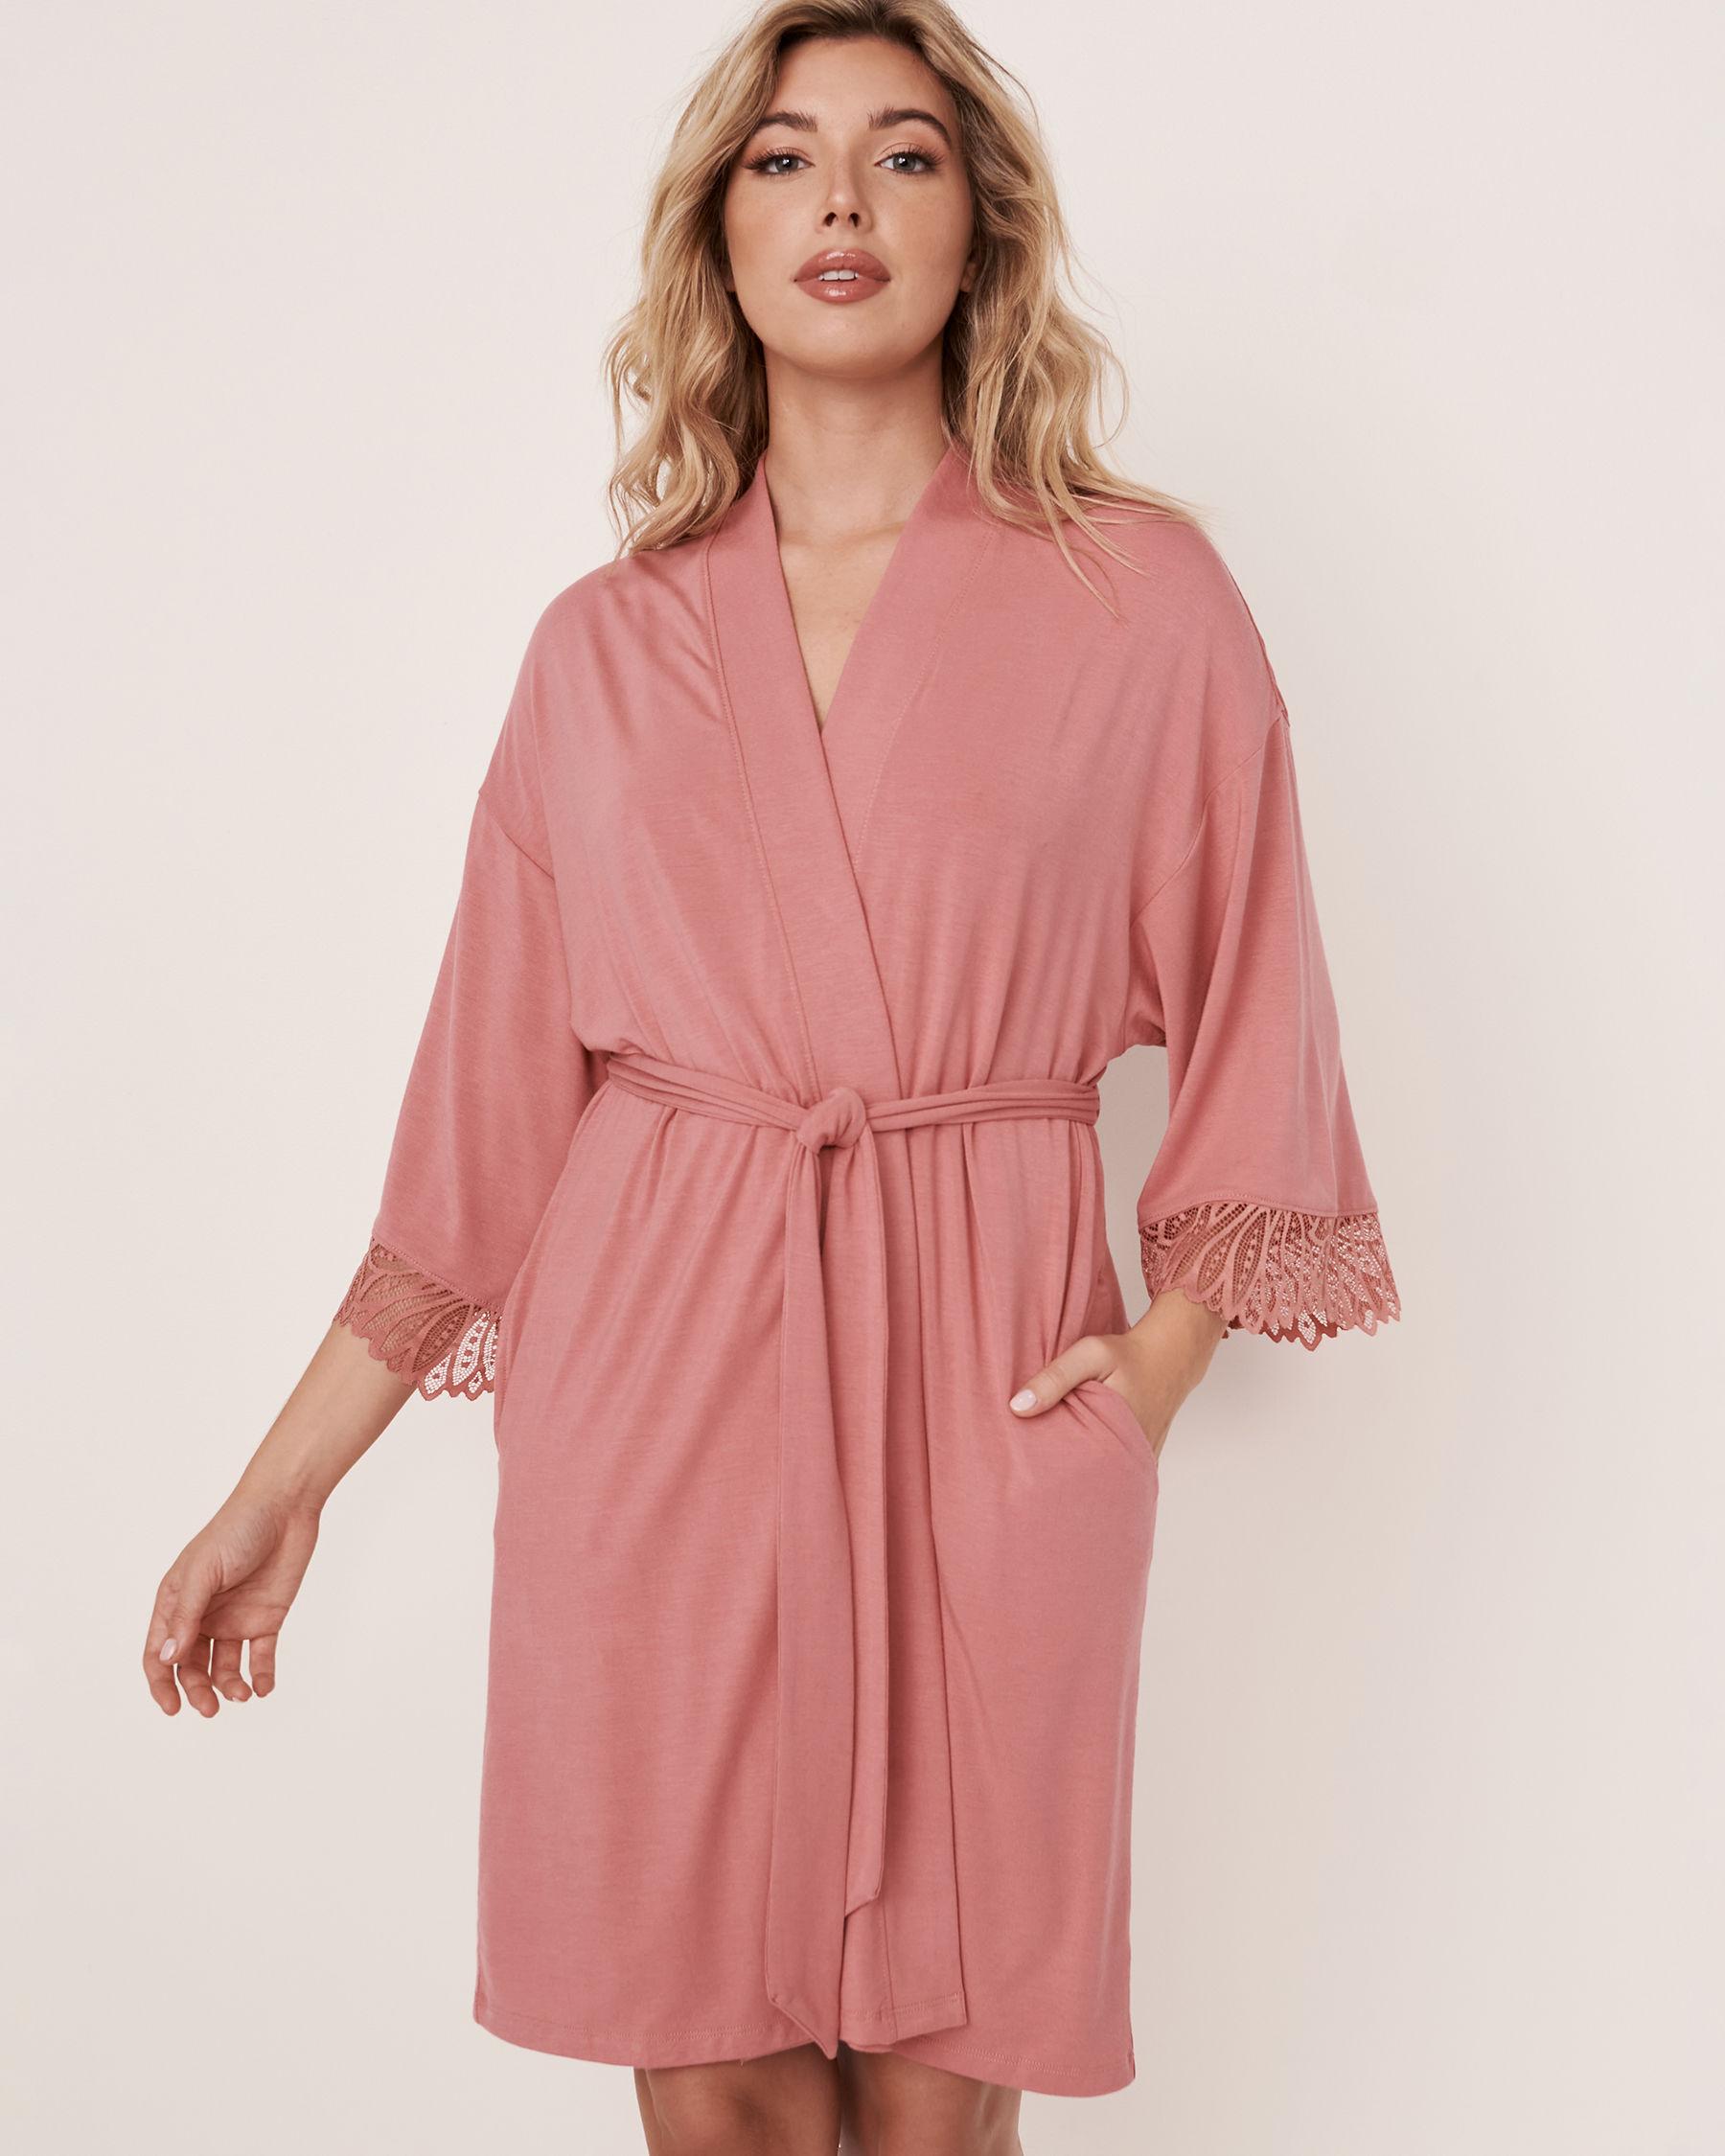 LA VIE EN ROSE Kimono garniture de dentelle en modal Vieux rose 40600020 - Voir1